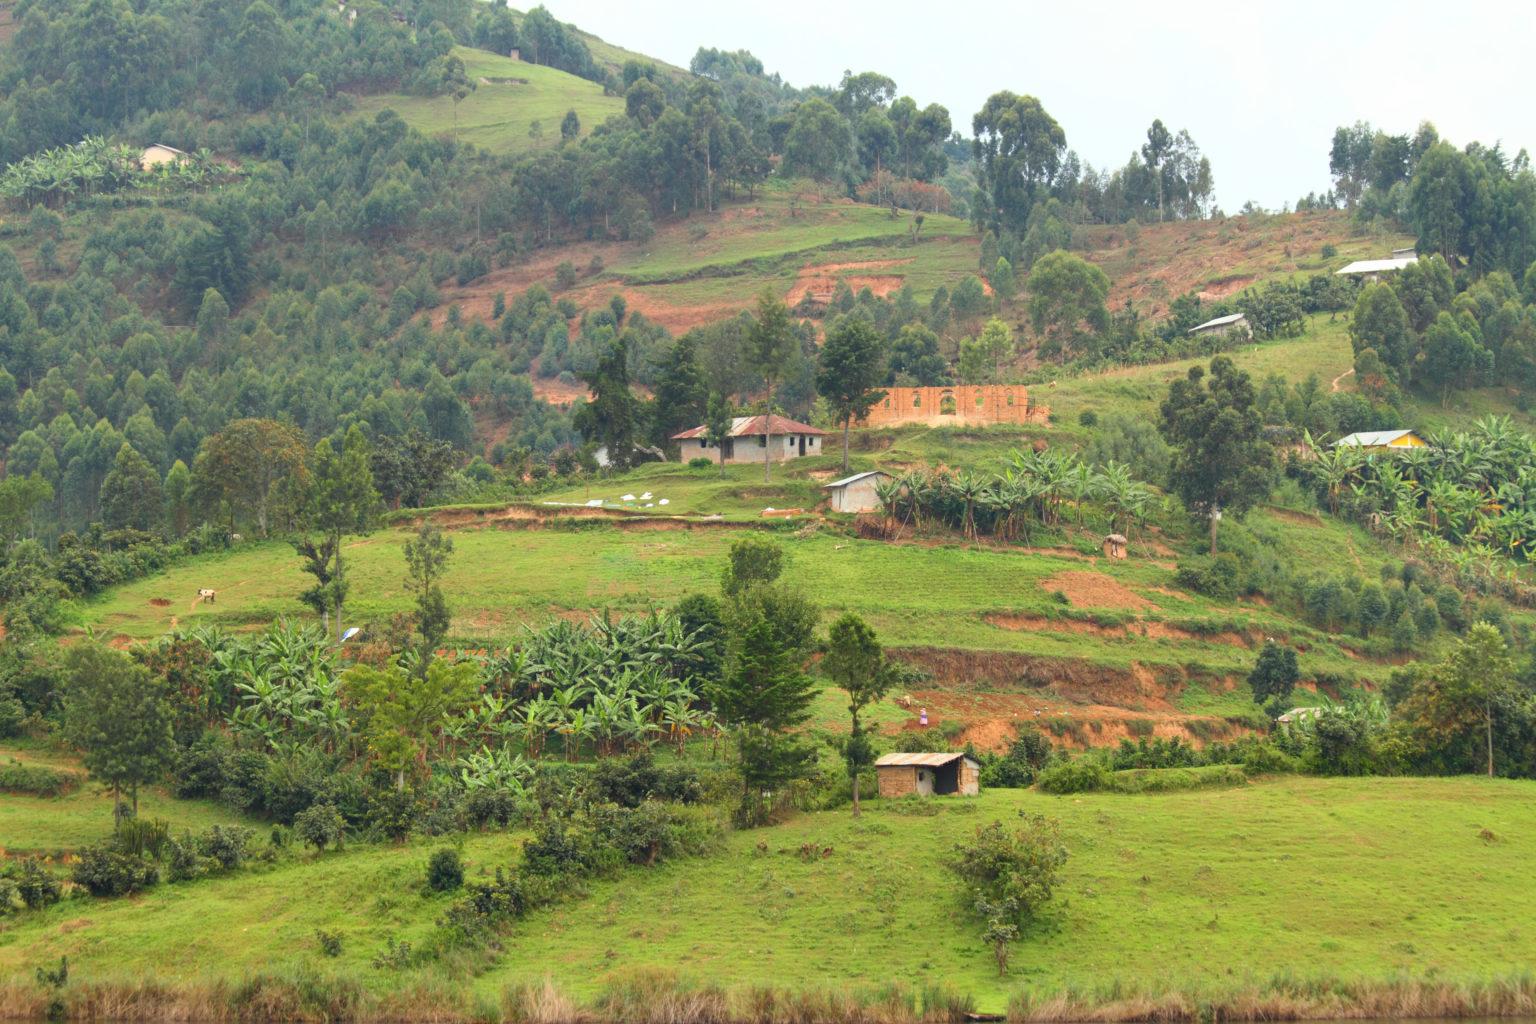 Rural farm communities on Lake Bunyoni Uganda